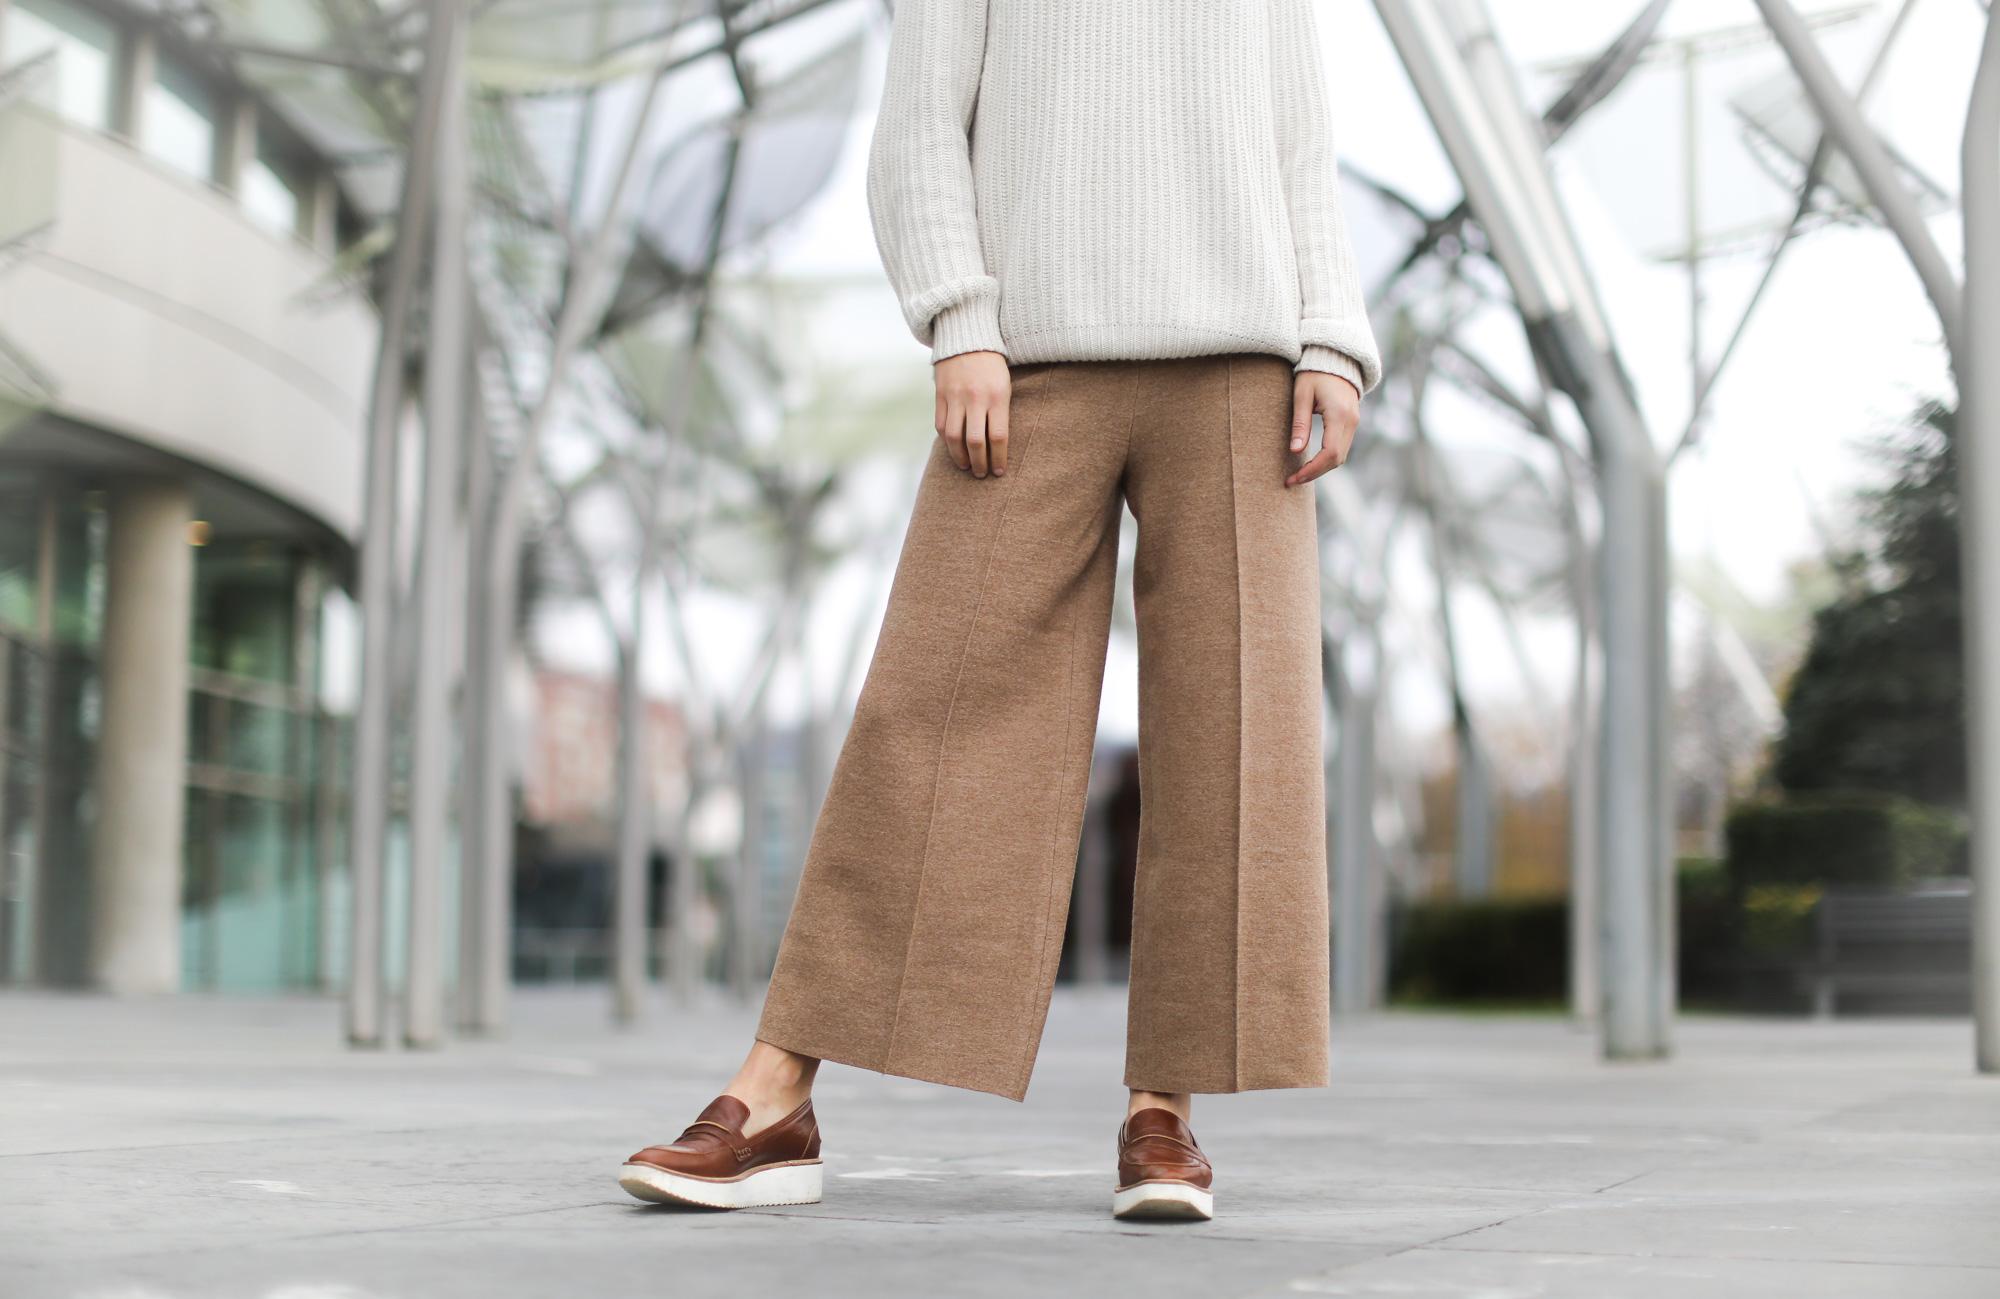 Clochet-streetstyle-szara-camel-wool-culottes-platforms-beige-knit-8